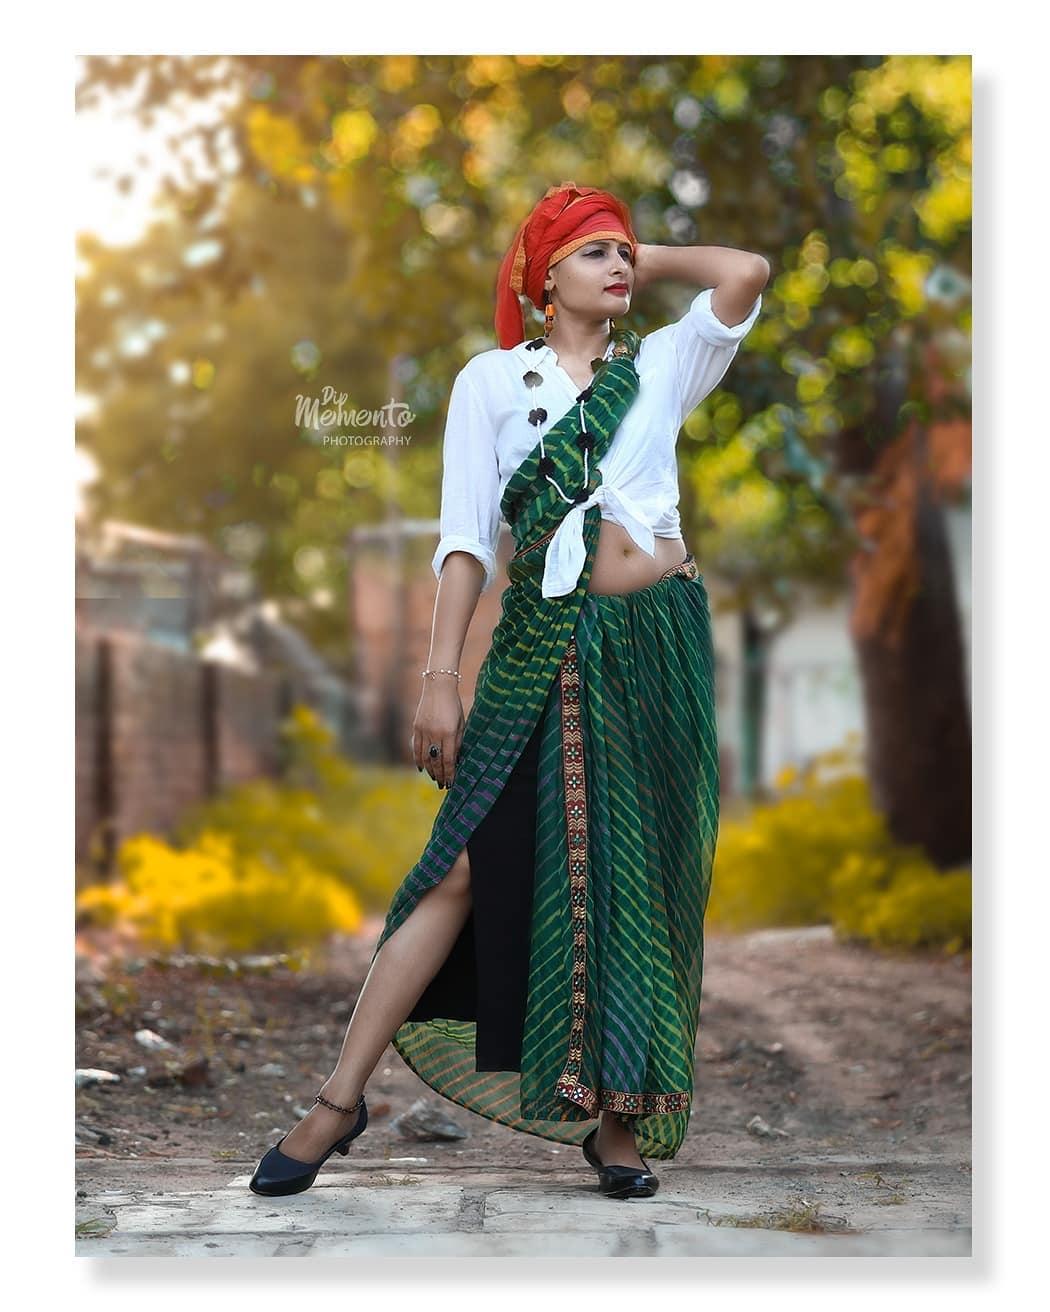 Dip Memento Photography,  Canon, Godox, Fashion, bloggerphotography, indian, gujarat, fashionphotographers, fashionmagazine, outfitinspiration, portfolioshoots, modelphotography, modeling, modelportfolio, photography, womenportrait, photographylovers, f4f, dancerslife, dancephotography, 9924227745, ahmedabad, vadodara, surat, rajkot, dipmementophotography